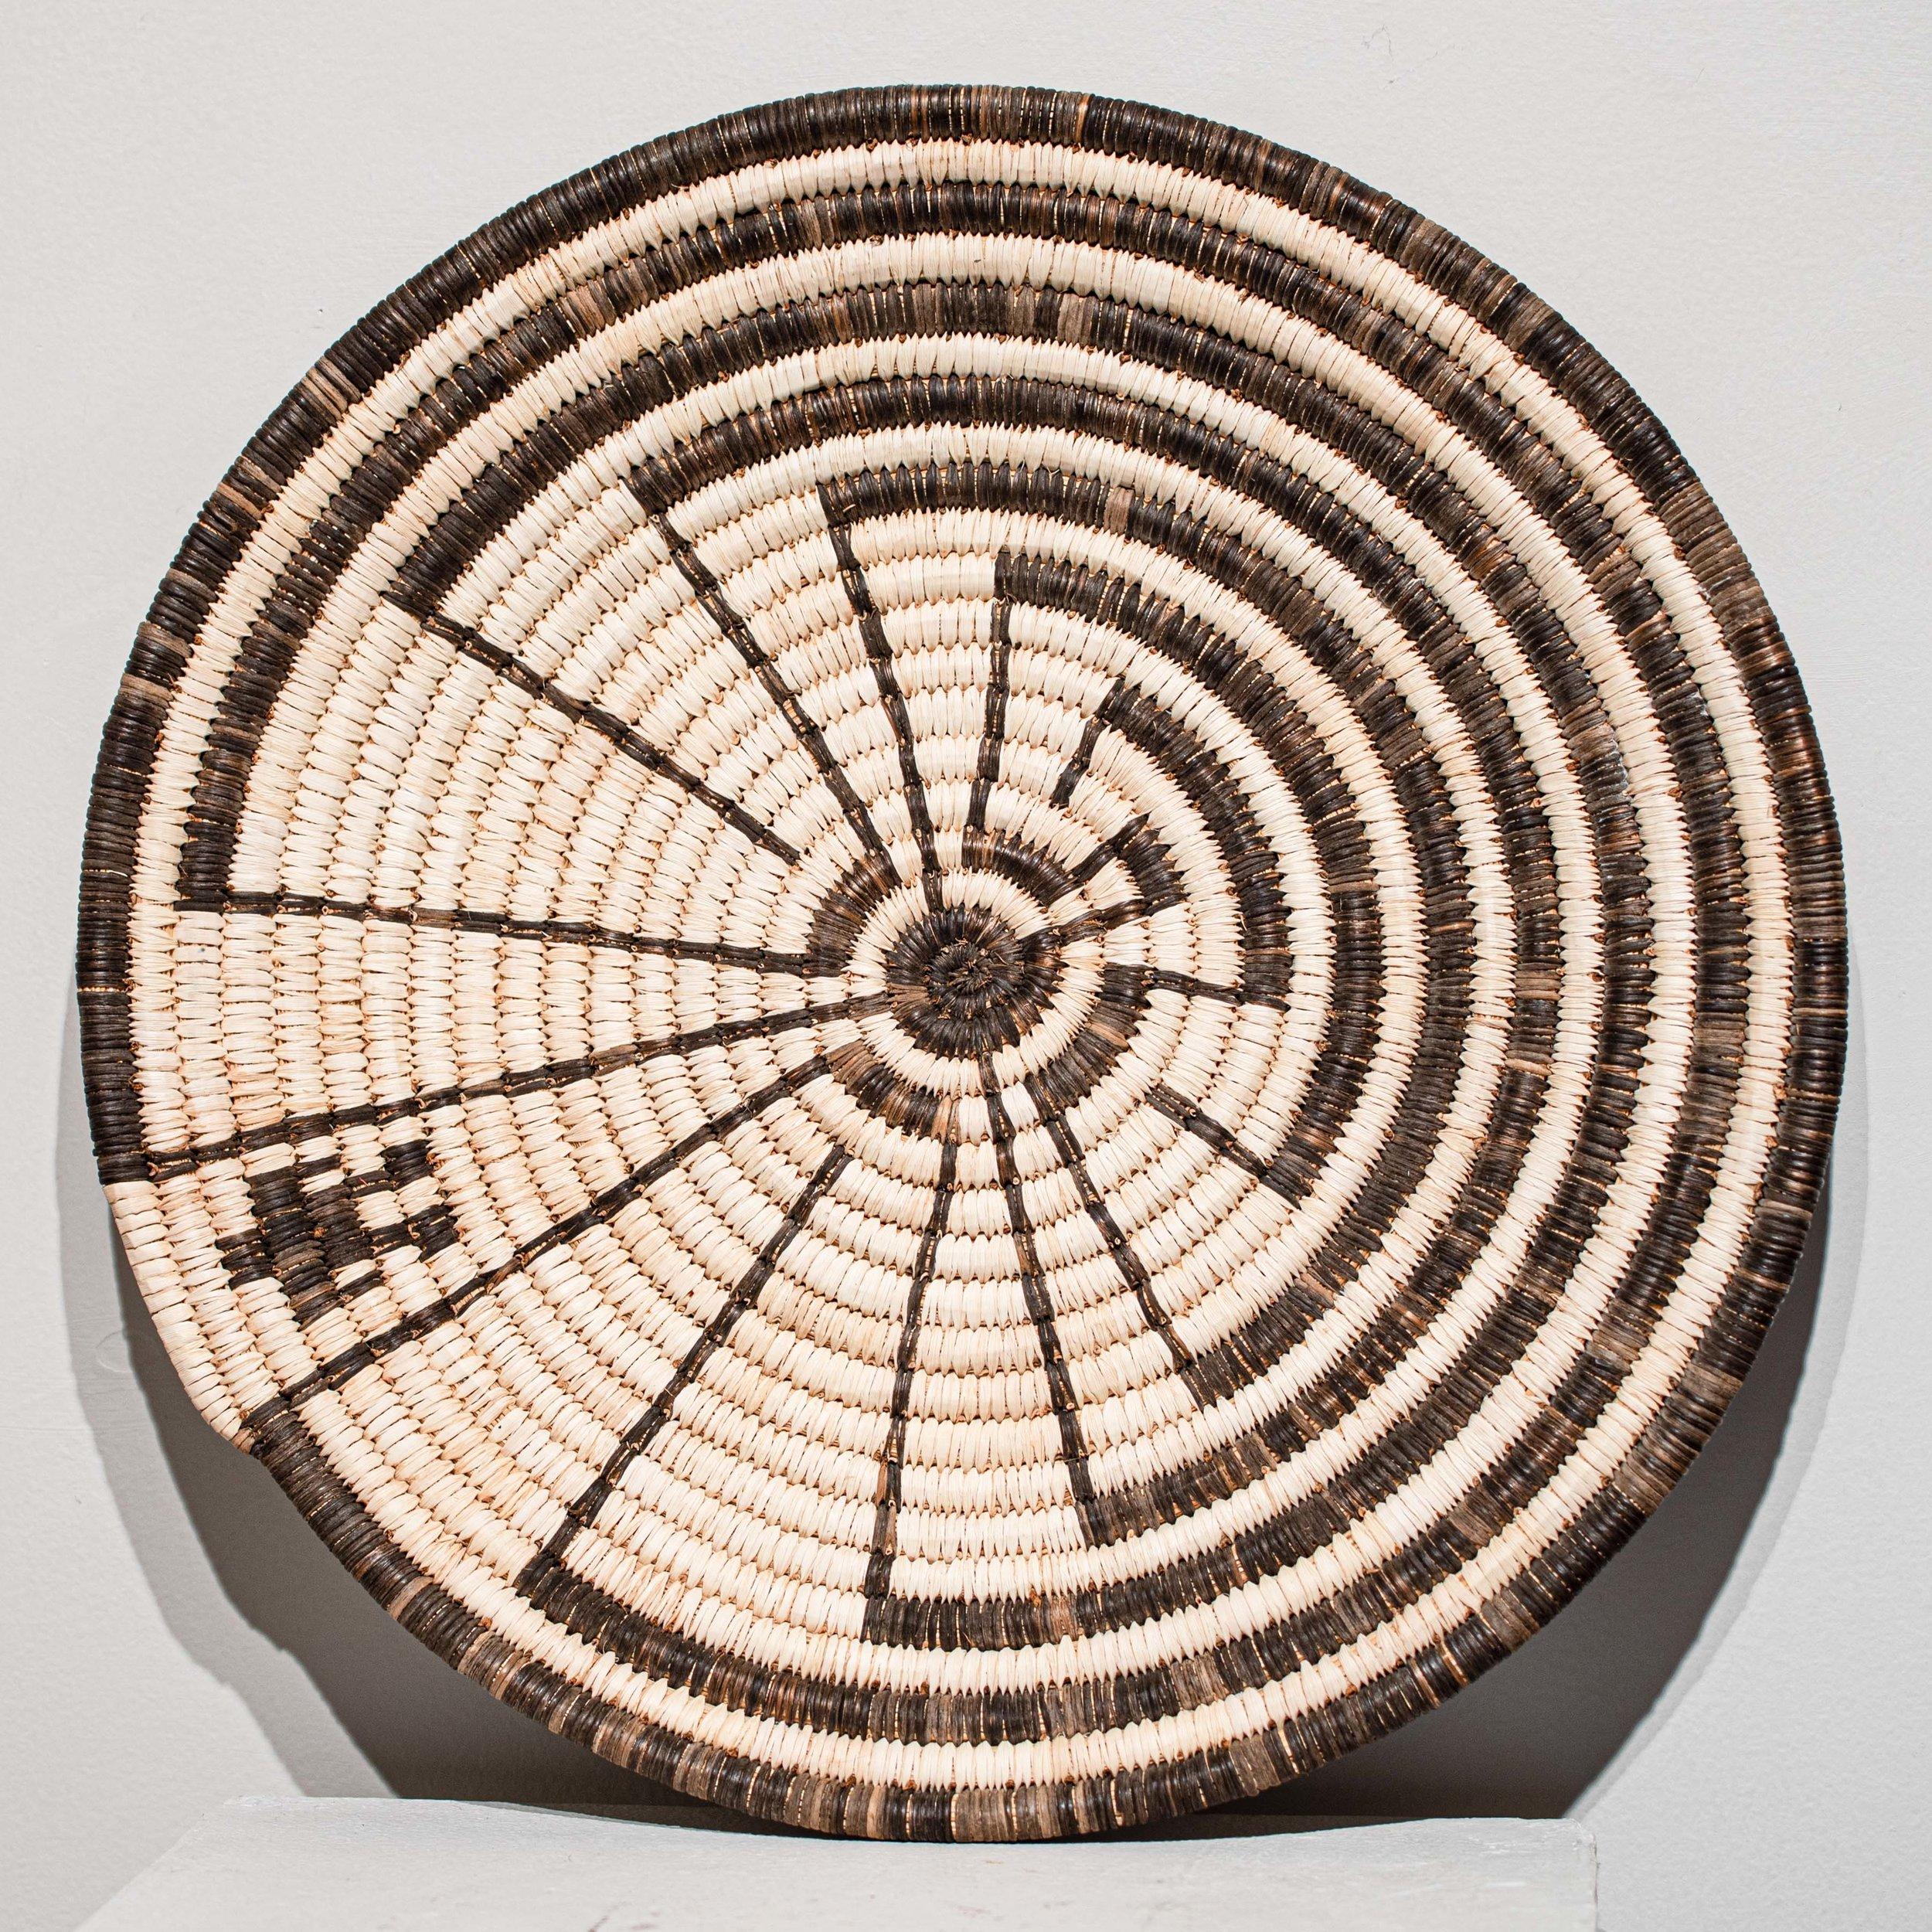 141. Tohono O'odham Woven Basket